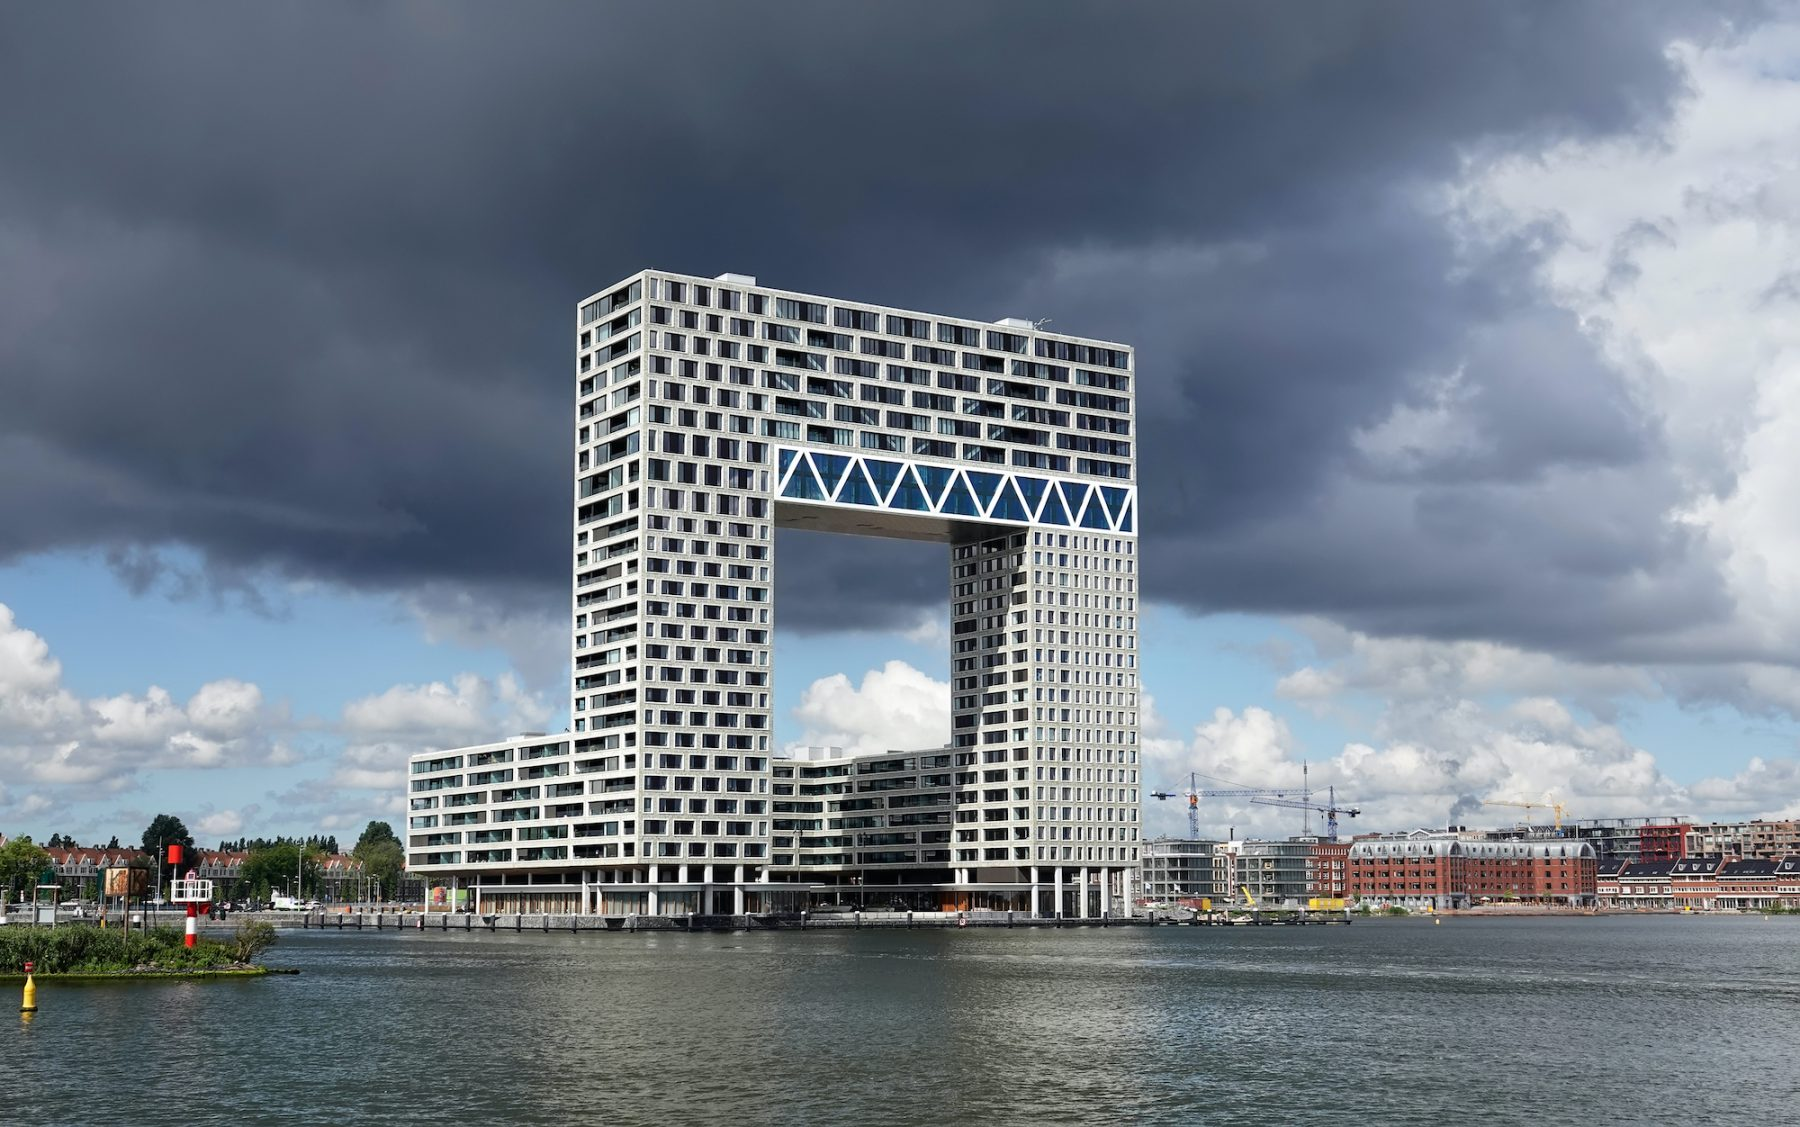 pontsteiger amsterdam penthouse